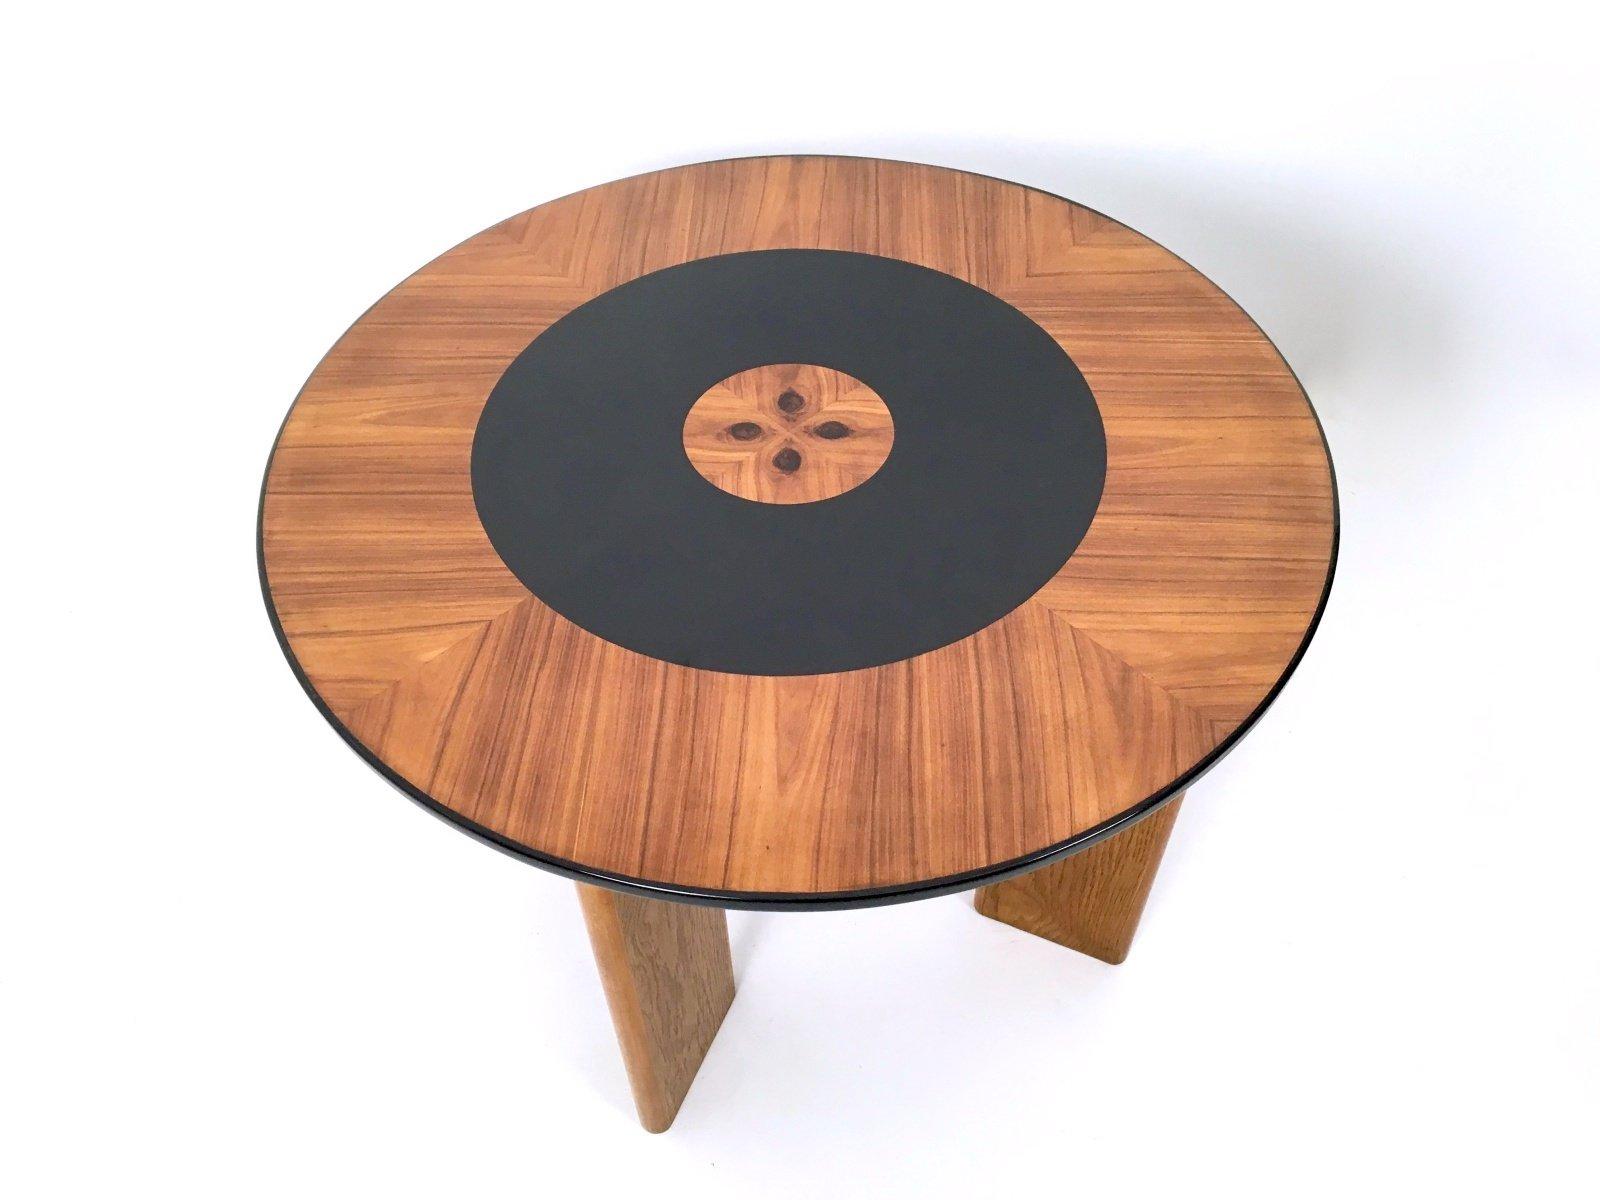 table de salle manger vintage en bois italie 1940s en vente sur pamono. Black Bedroom Furniture Sets. Home Design Ideas